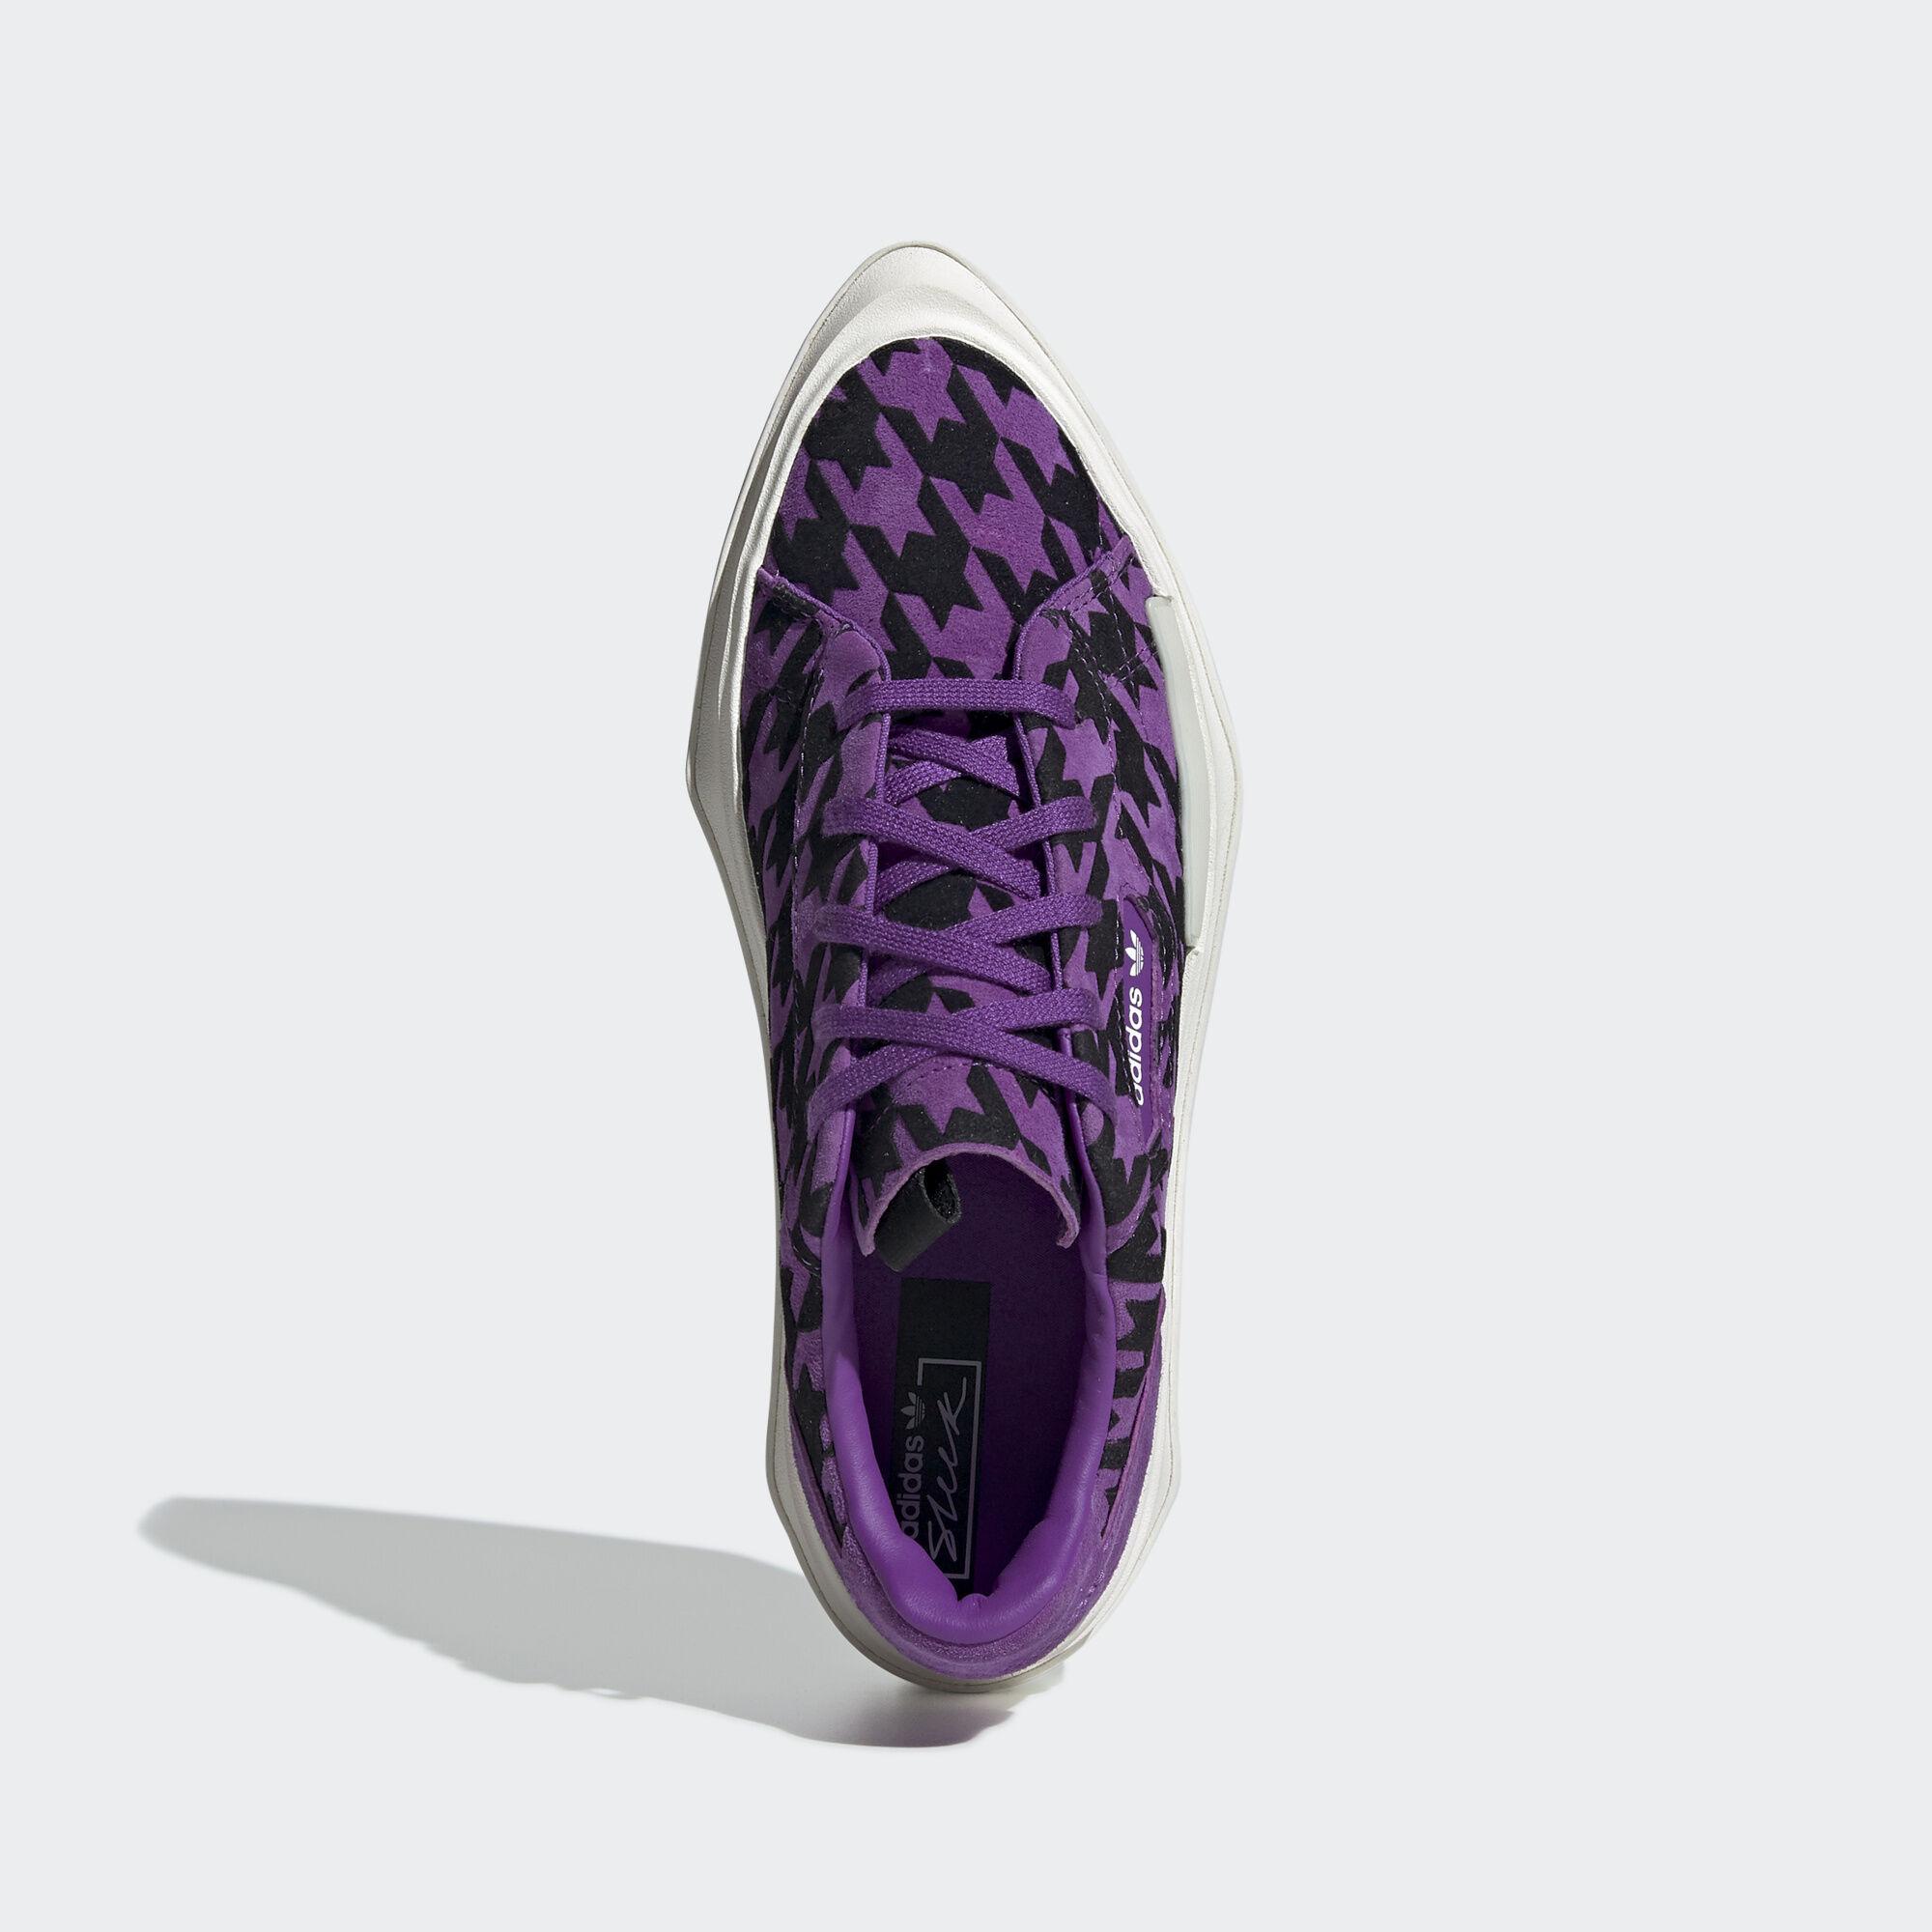 Adidas Hypersleek G54057